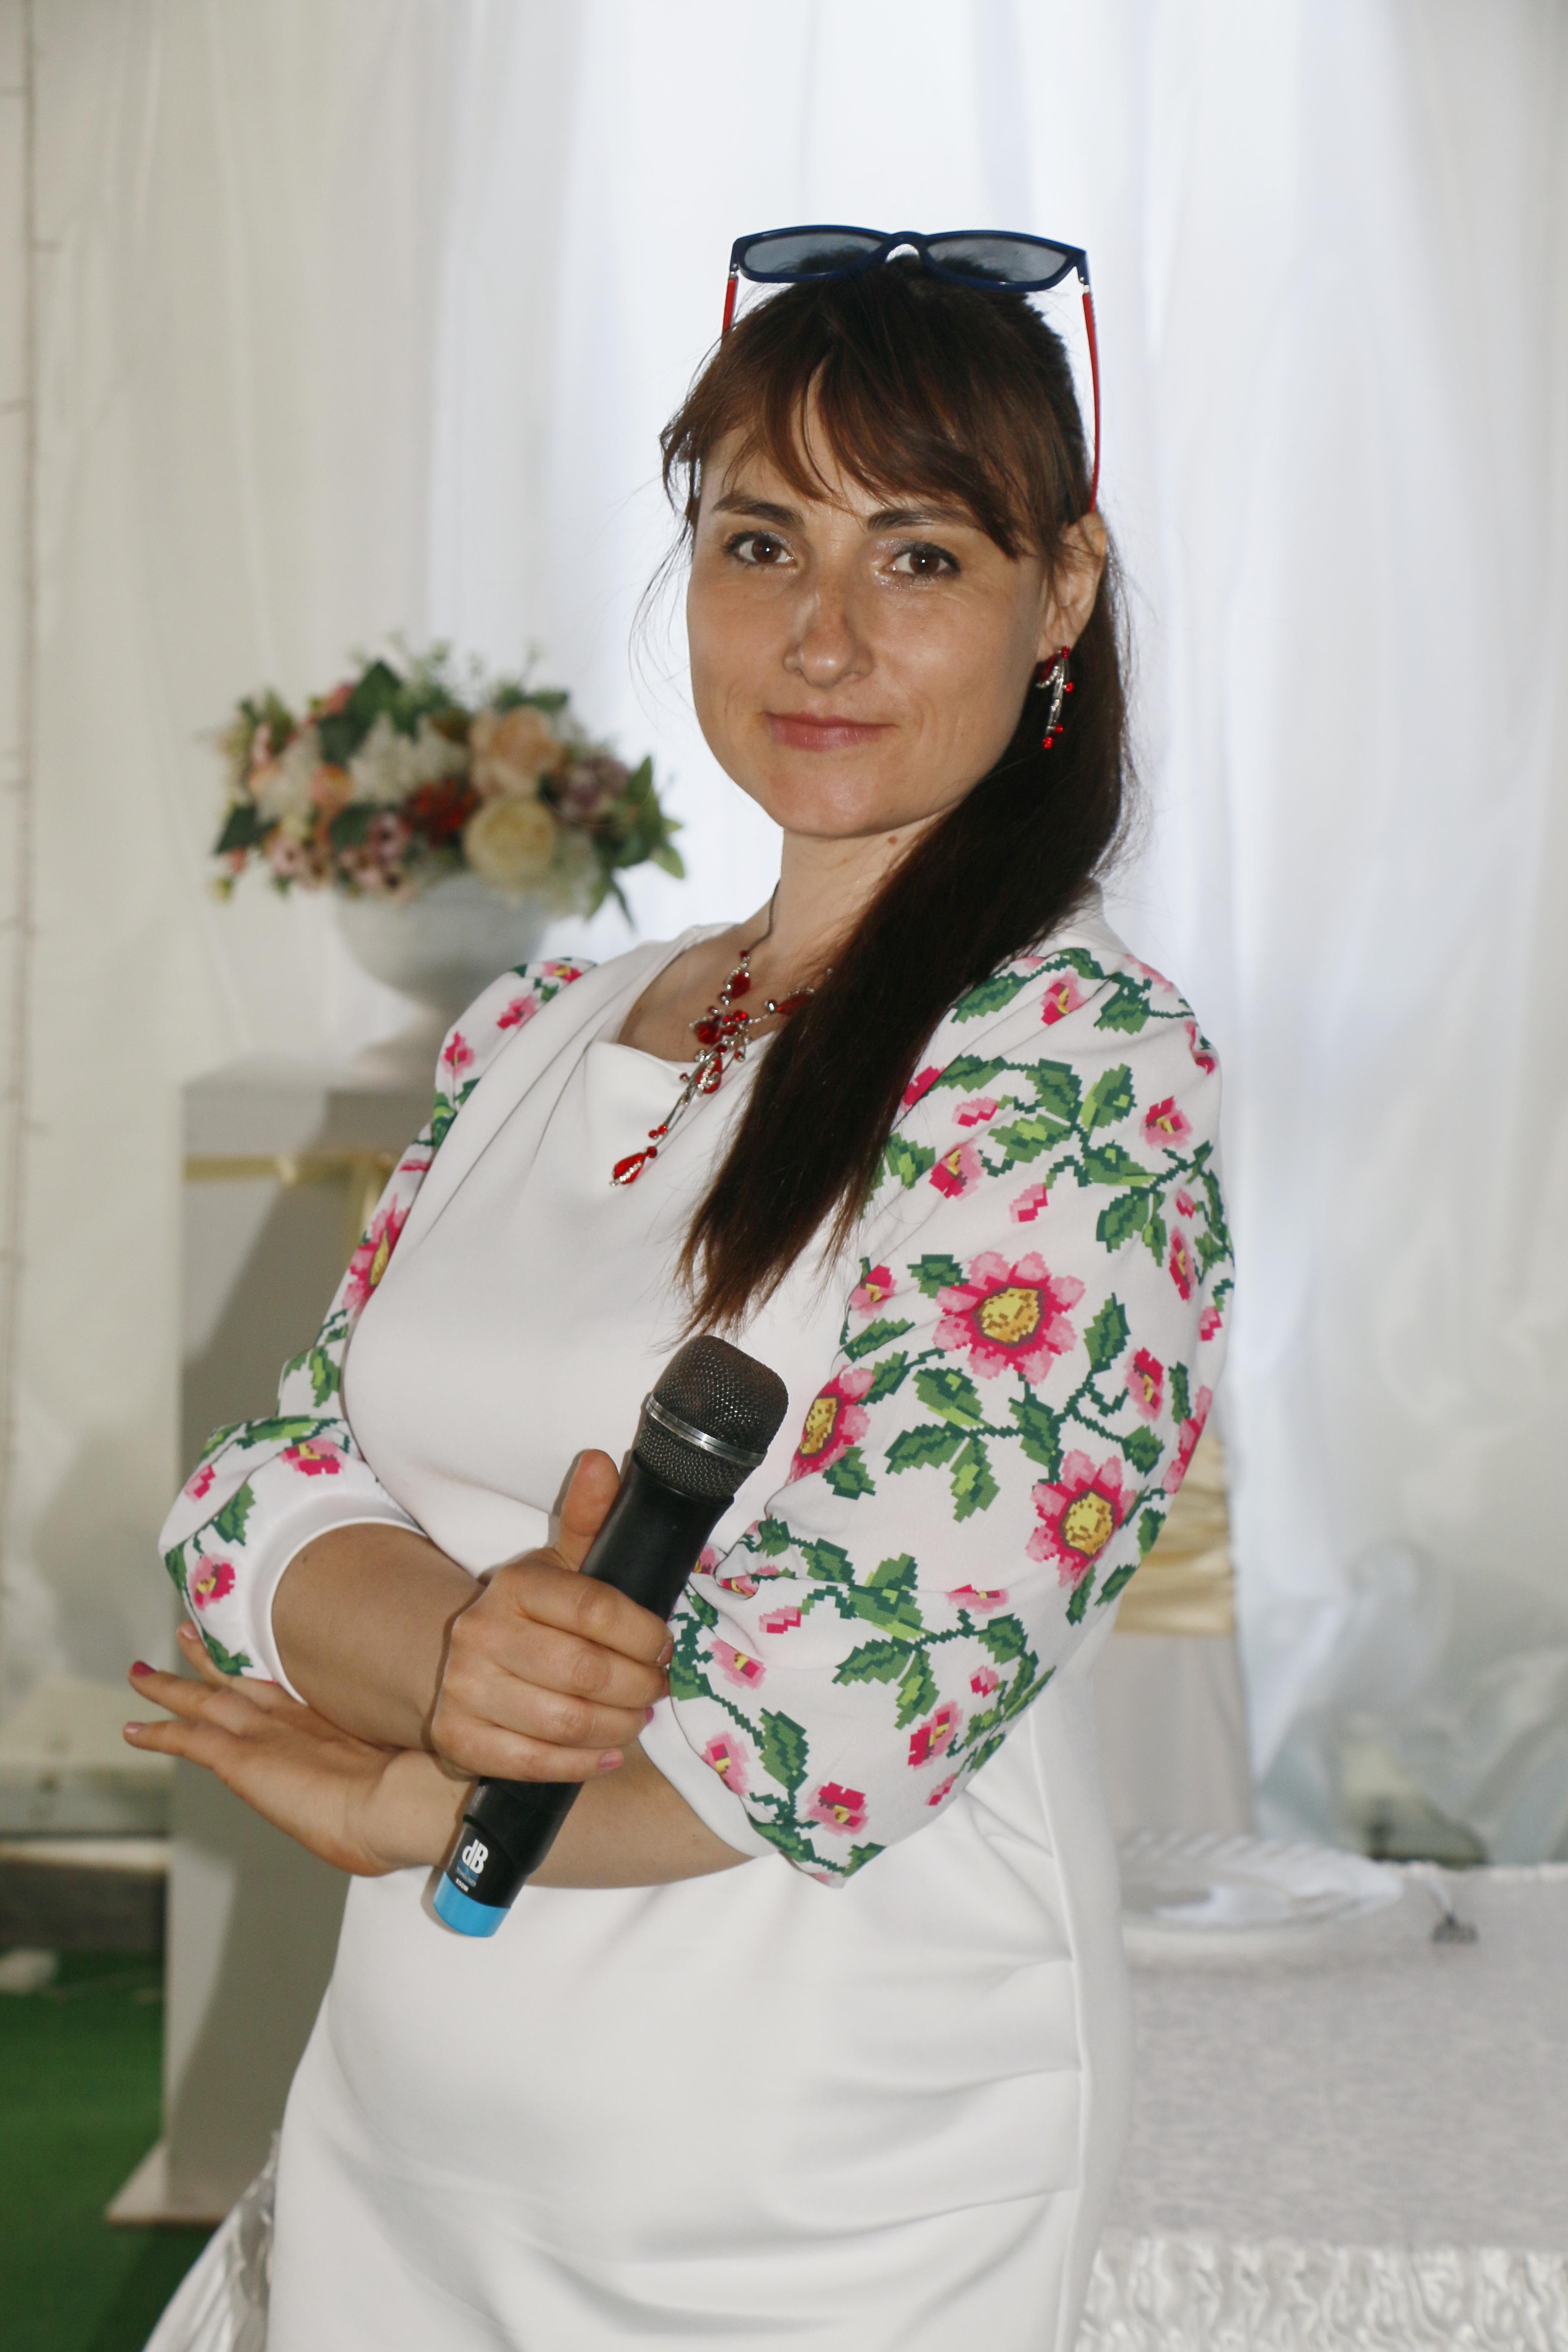 Наталья Ткаченко (Незабудка) в Ростове-на-Дону